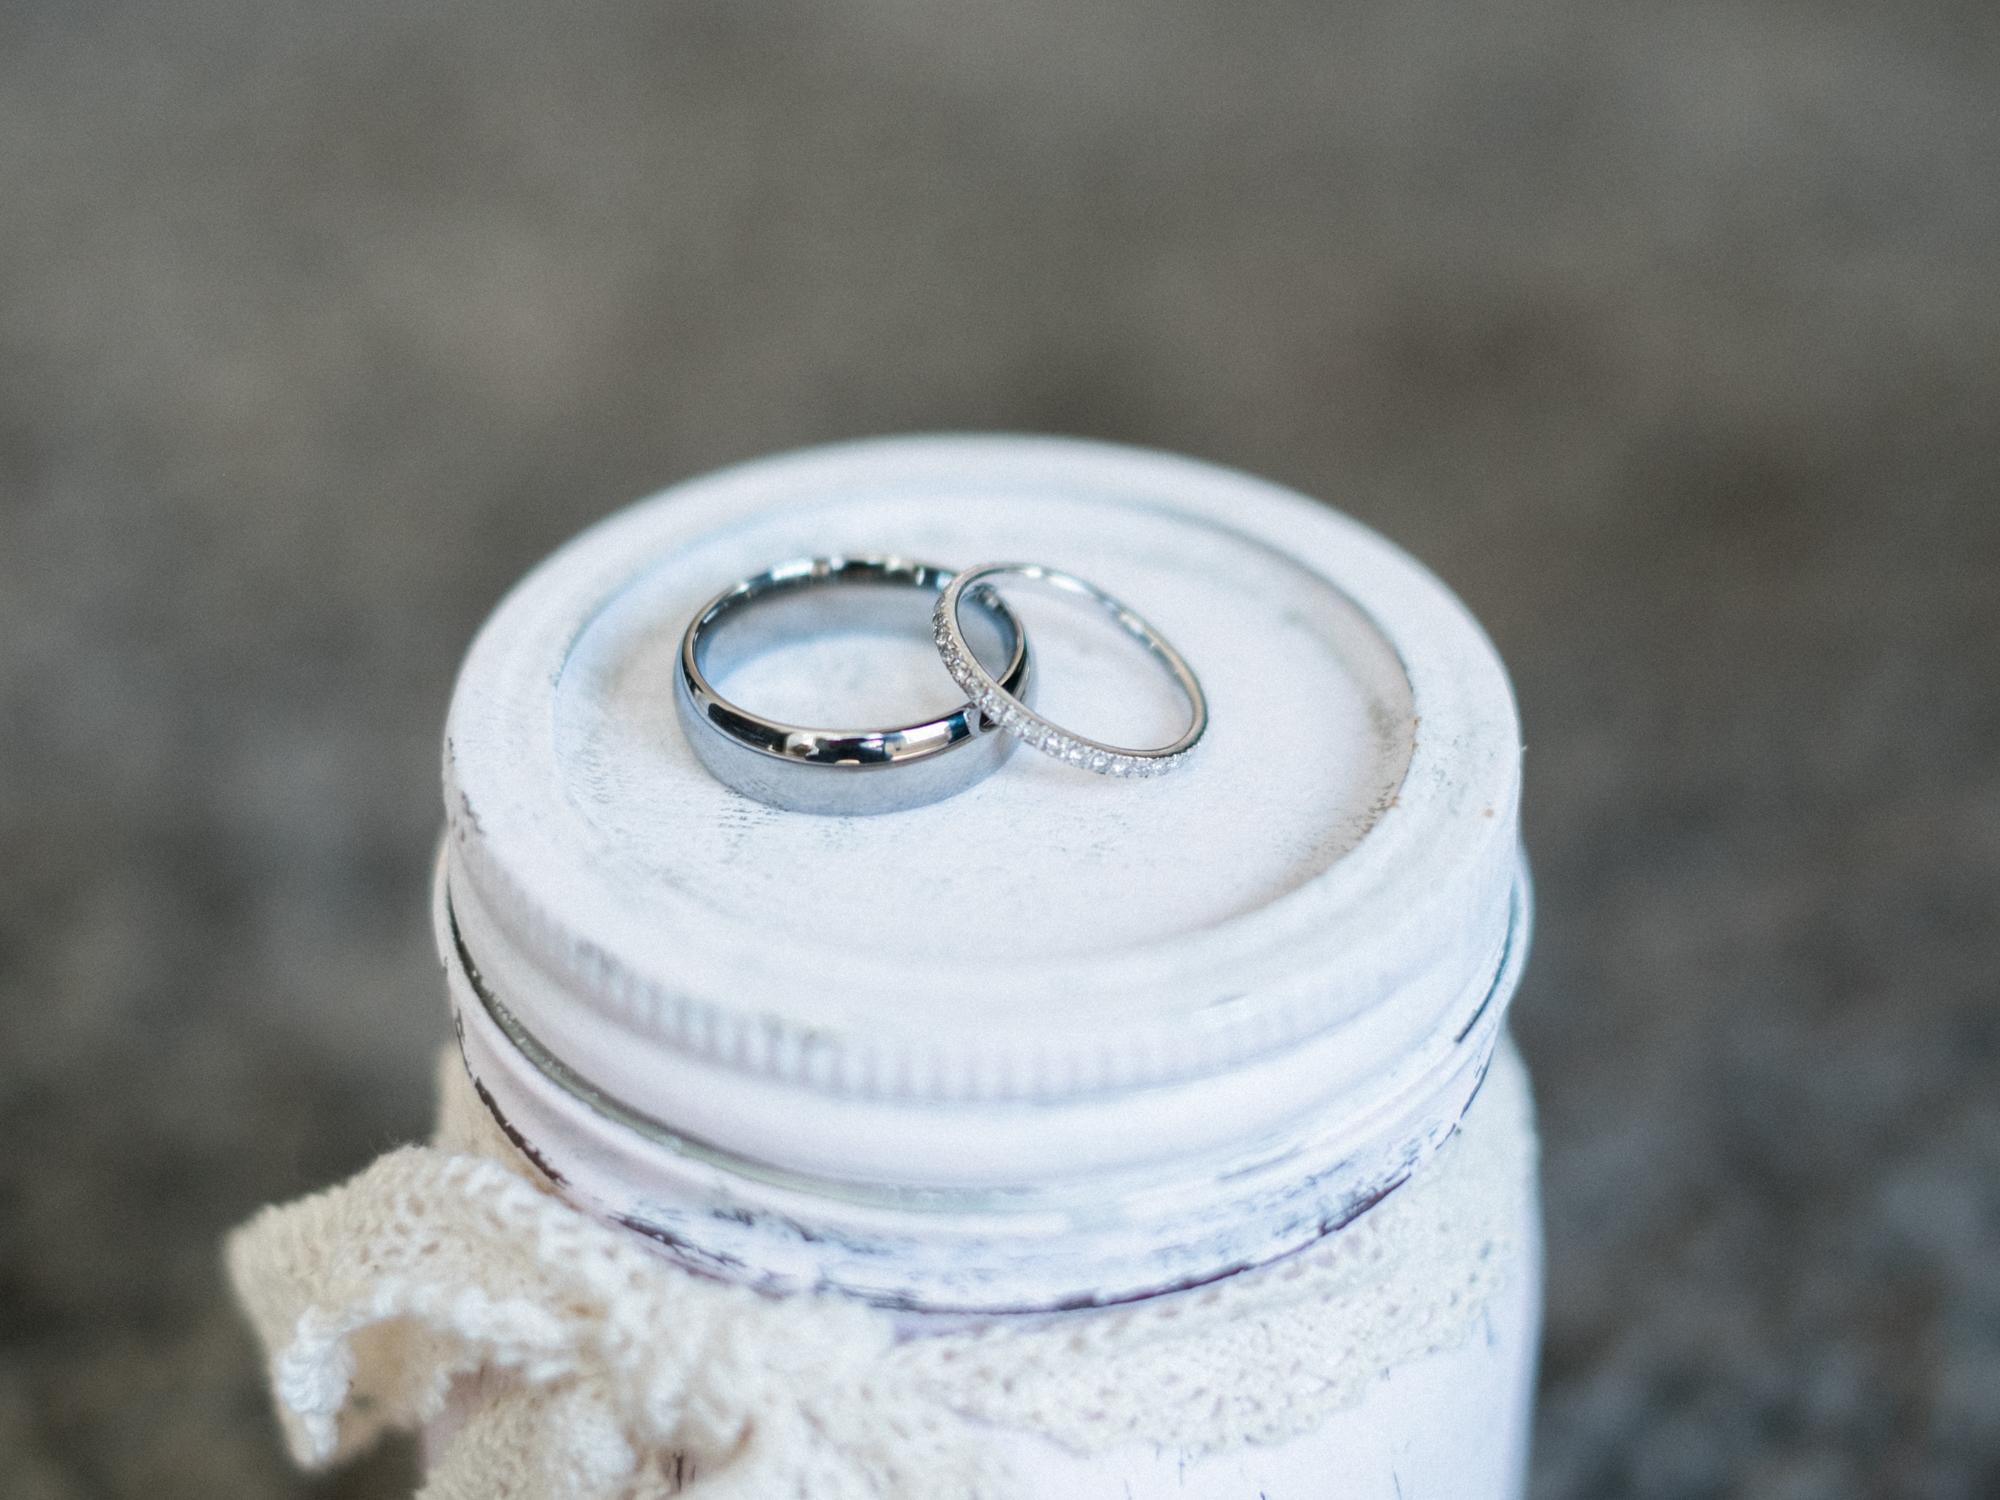 Close-up of wedding bands